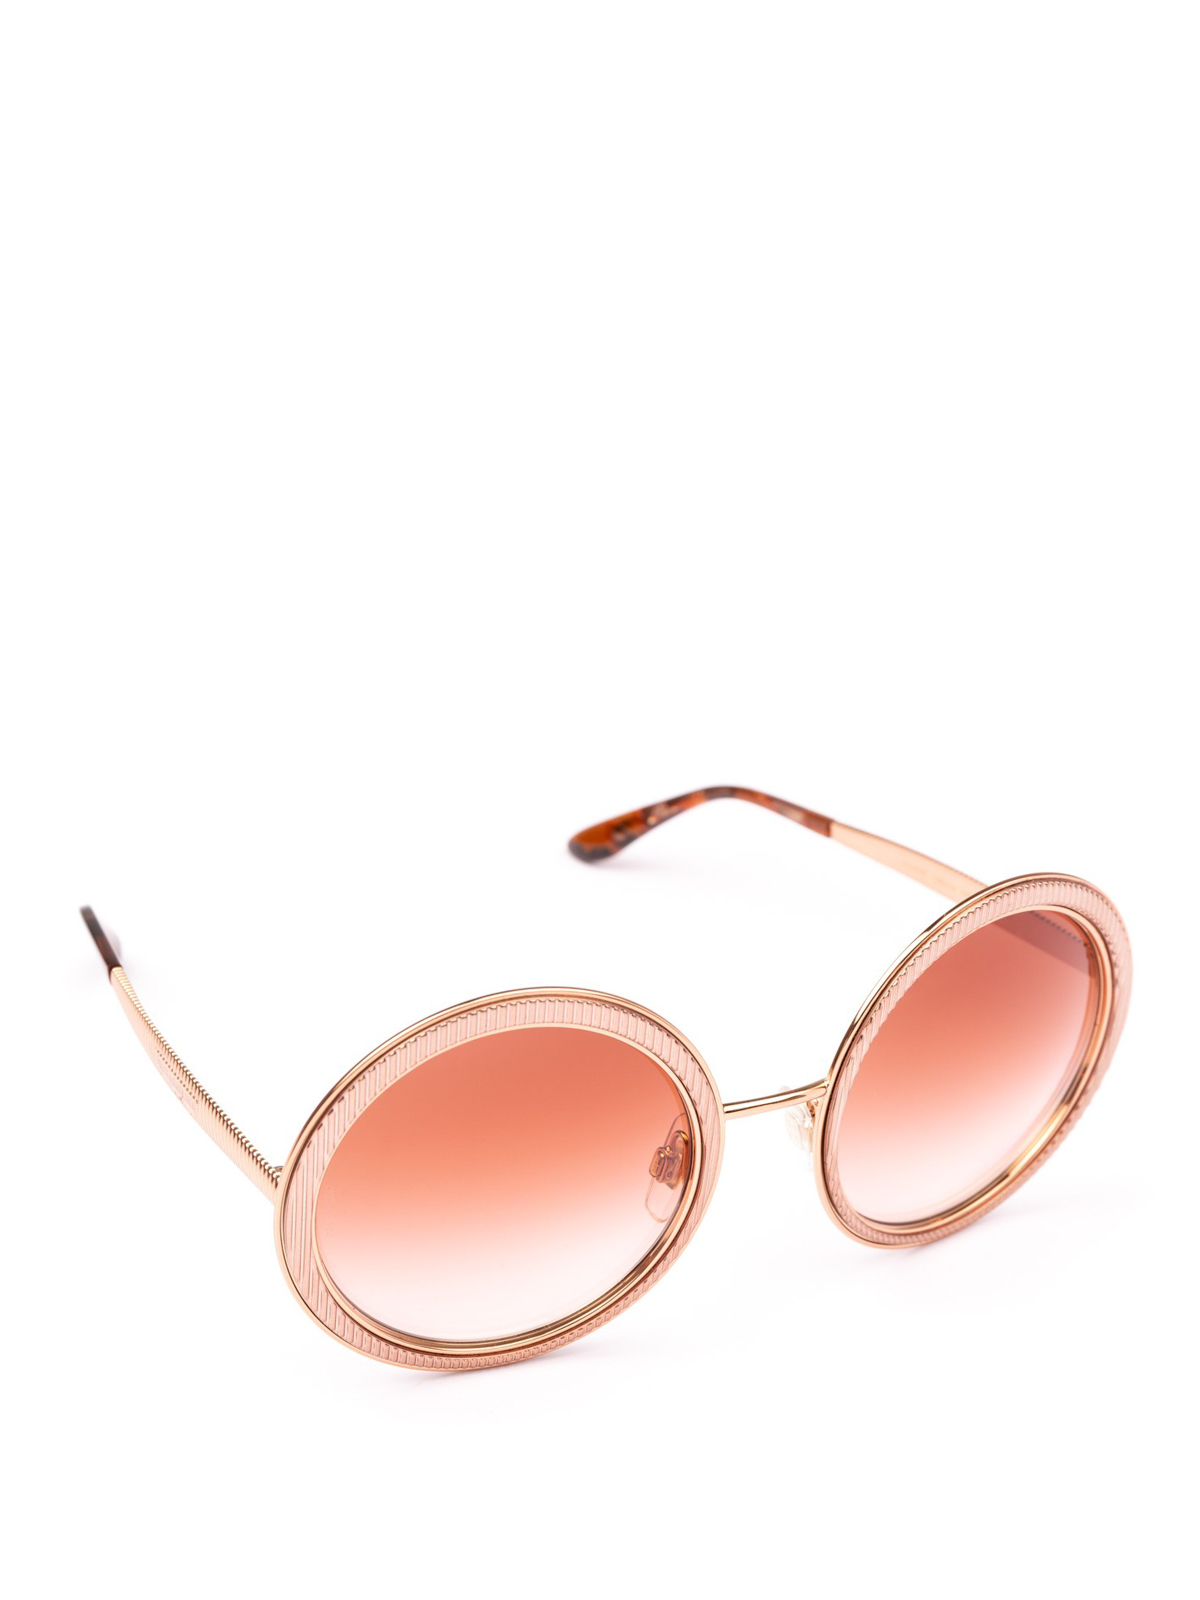 e9648dea3473 DOLCE & GABBANA: sunglasses - Engraved rose gold metal round sunglasses